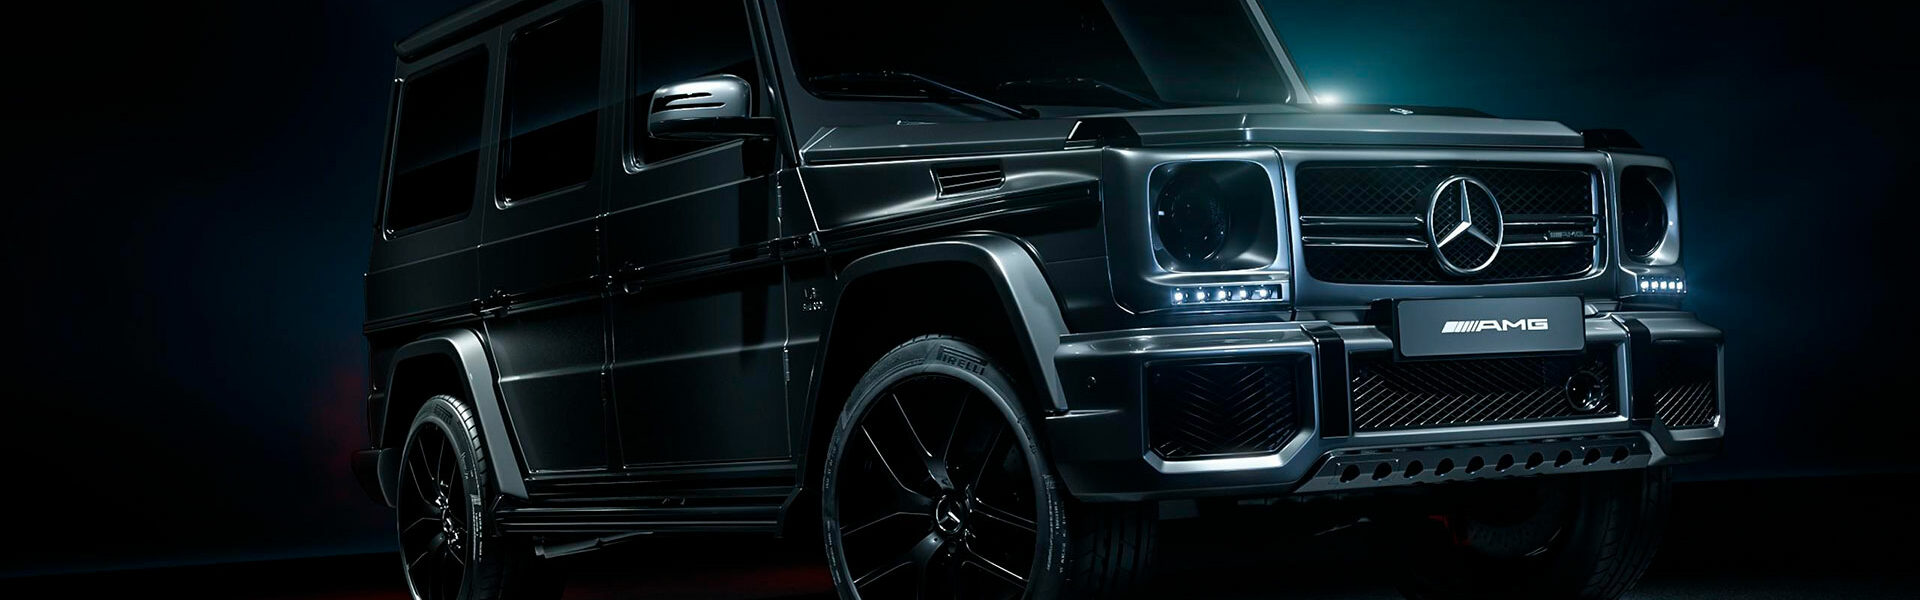 Blog | GTR Auto